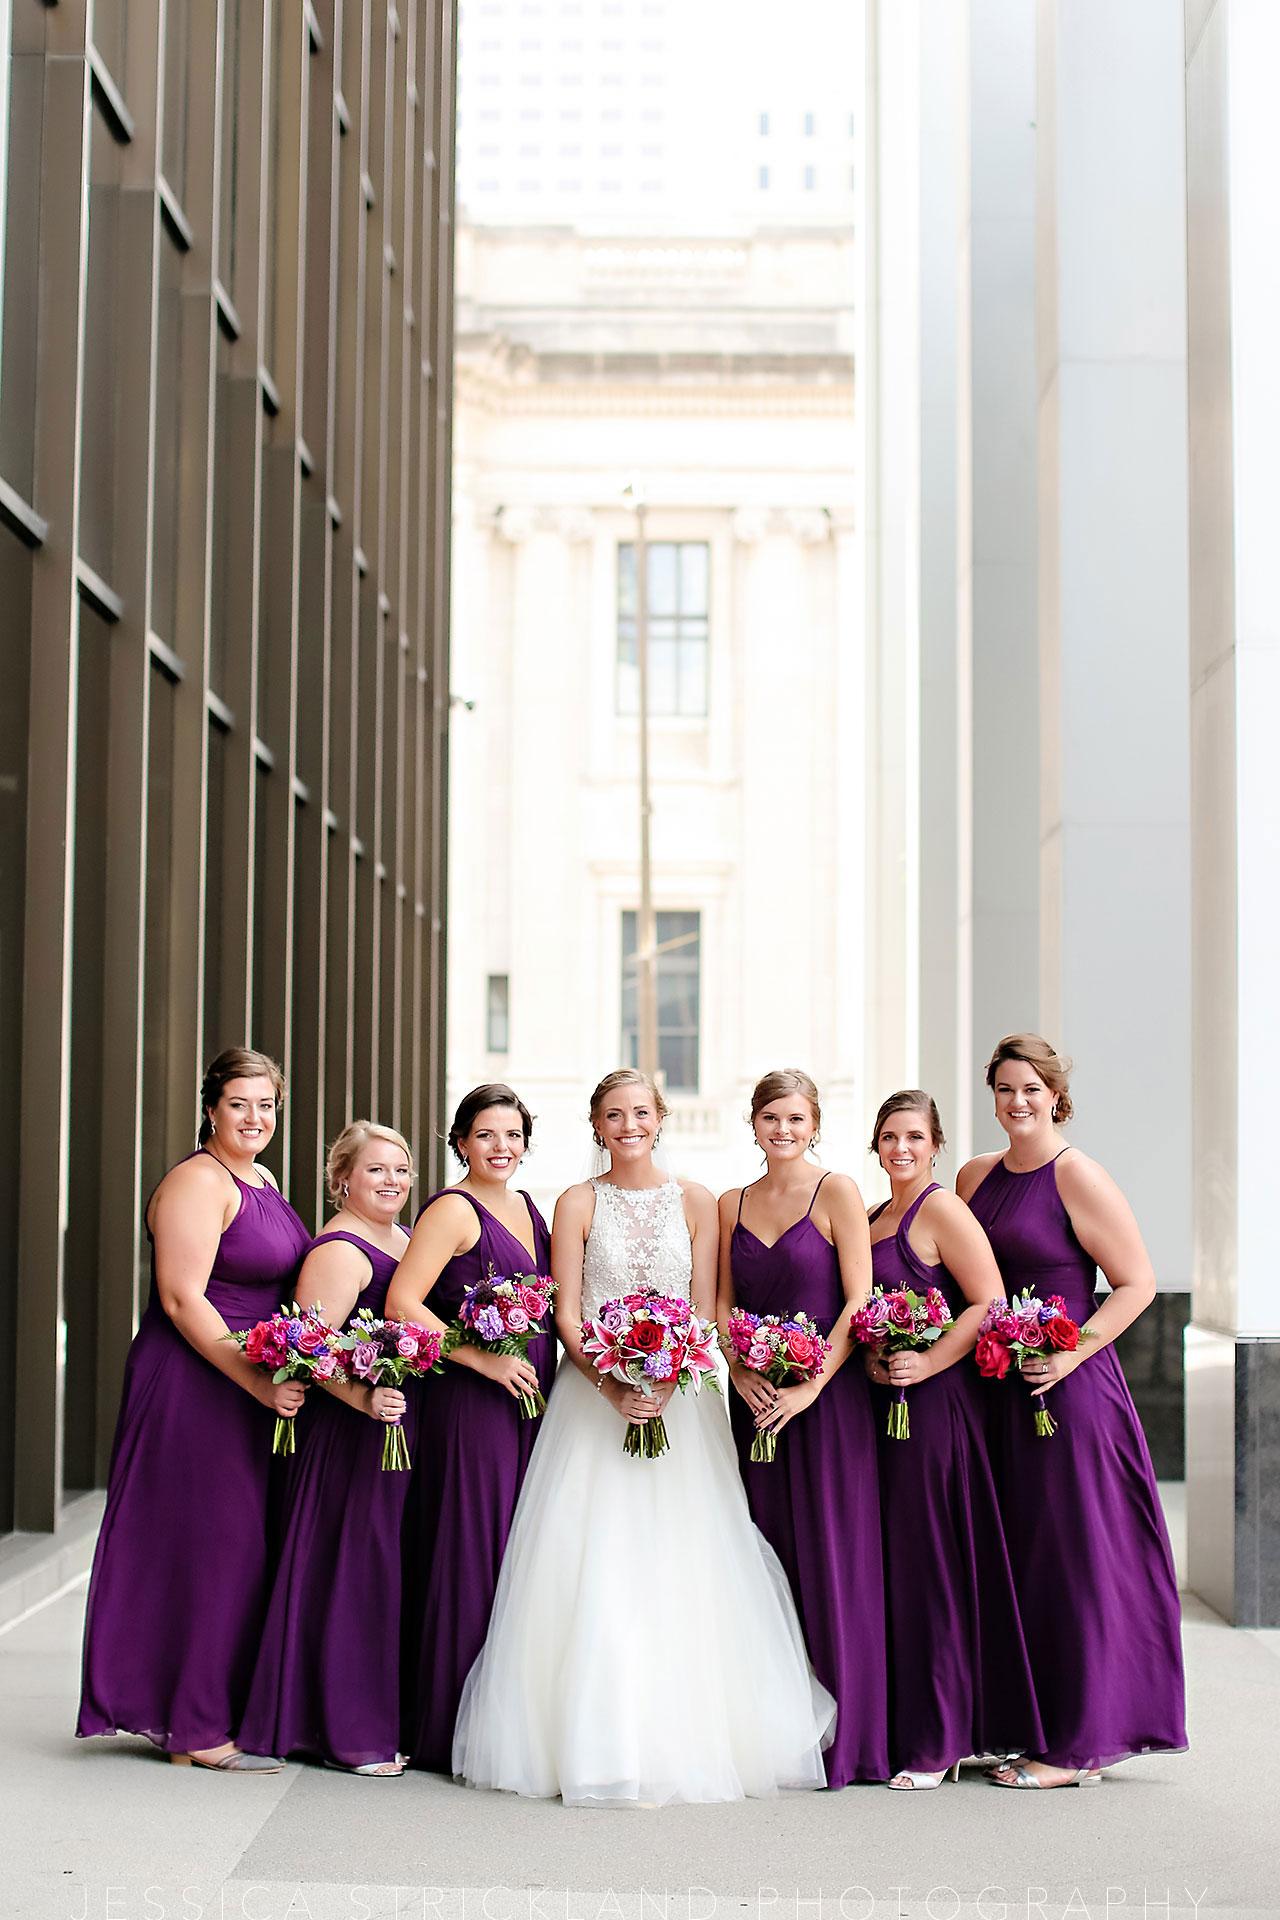 Serra Alex Regions Tower Indianapolis Wedding 069 watermarked